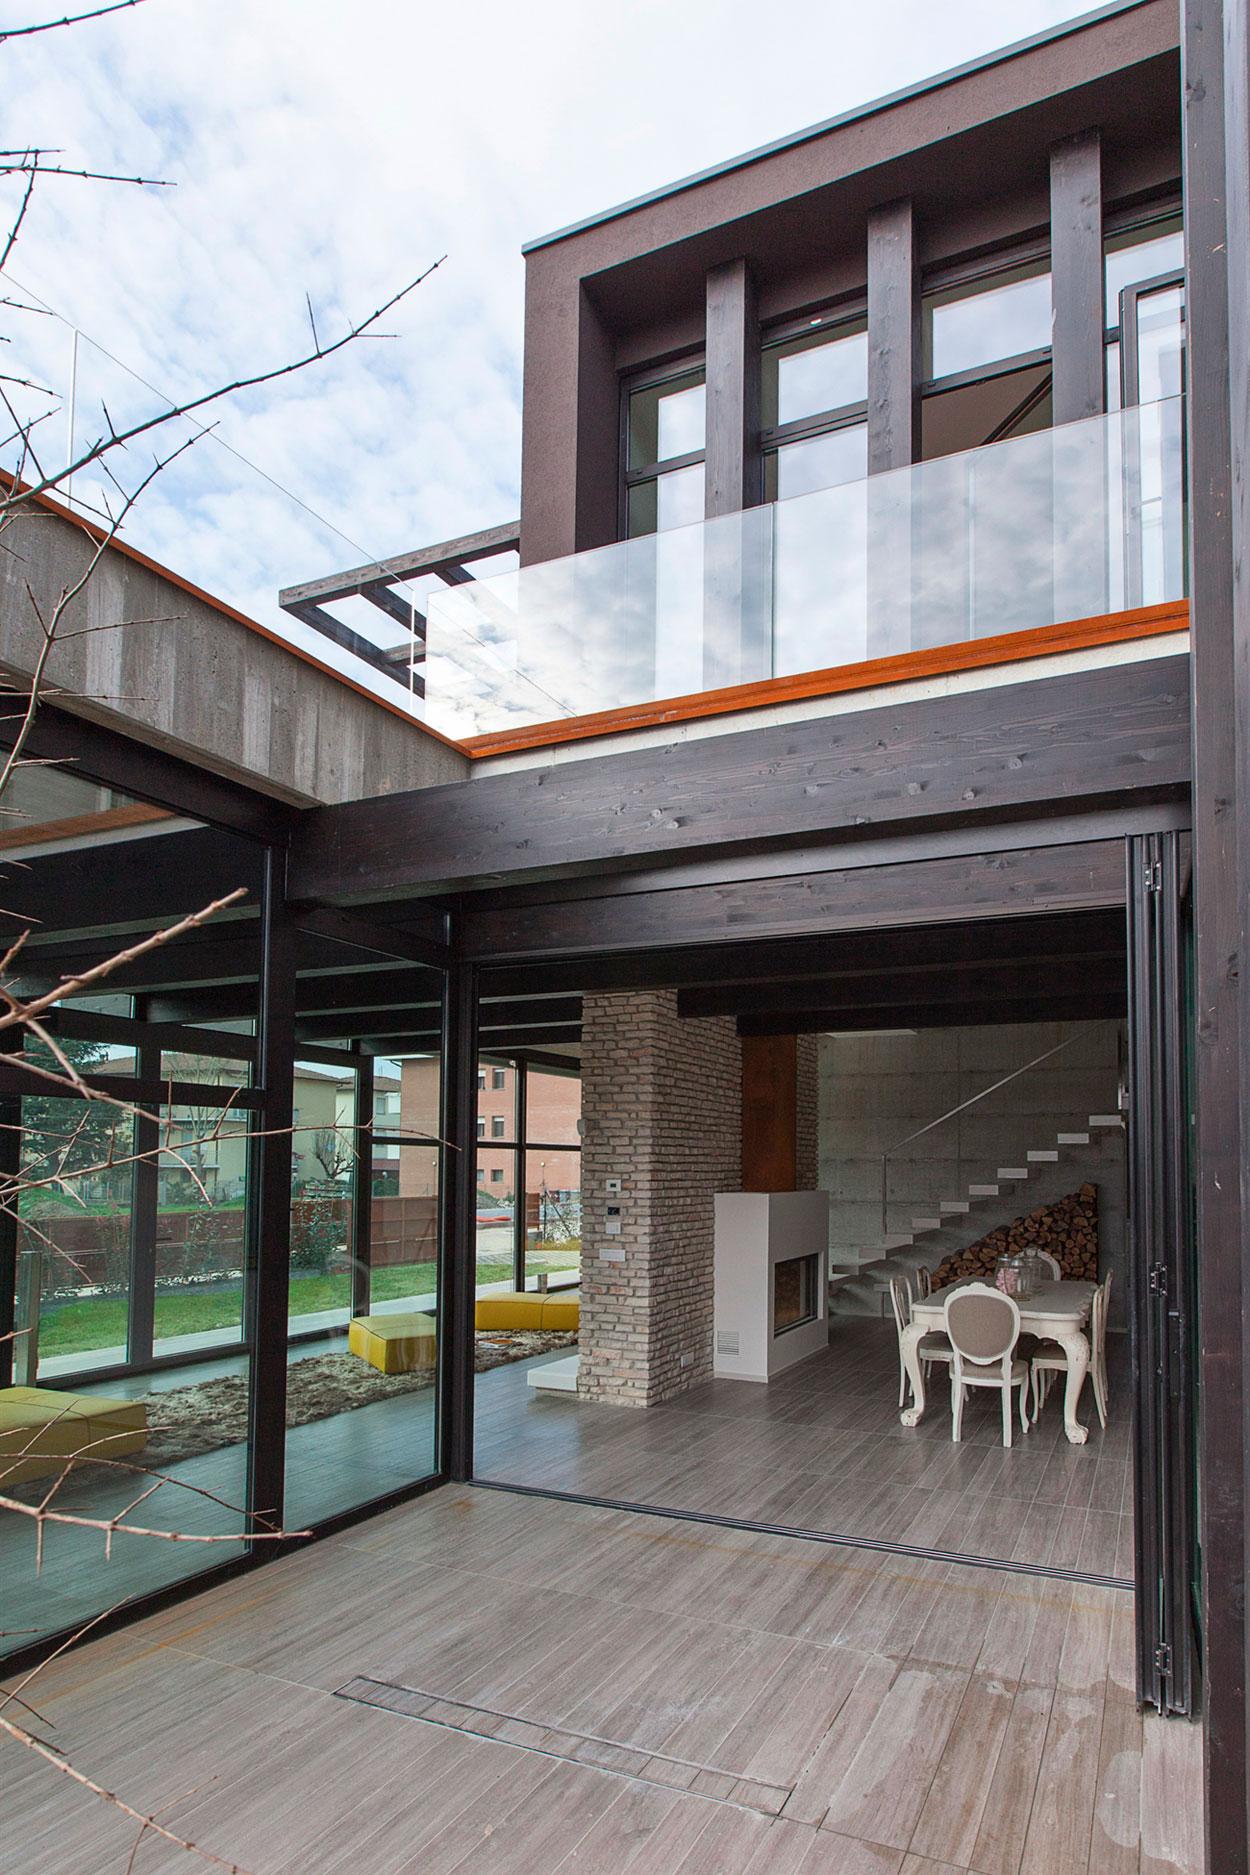 D'Autore Residence near Bologna by Giraldi Associati Architetti-07